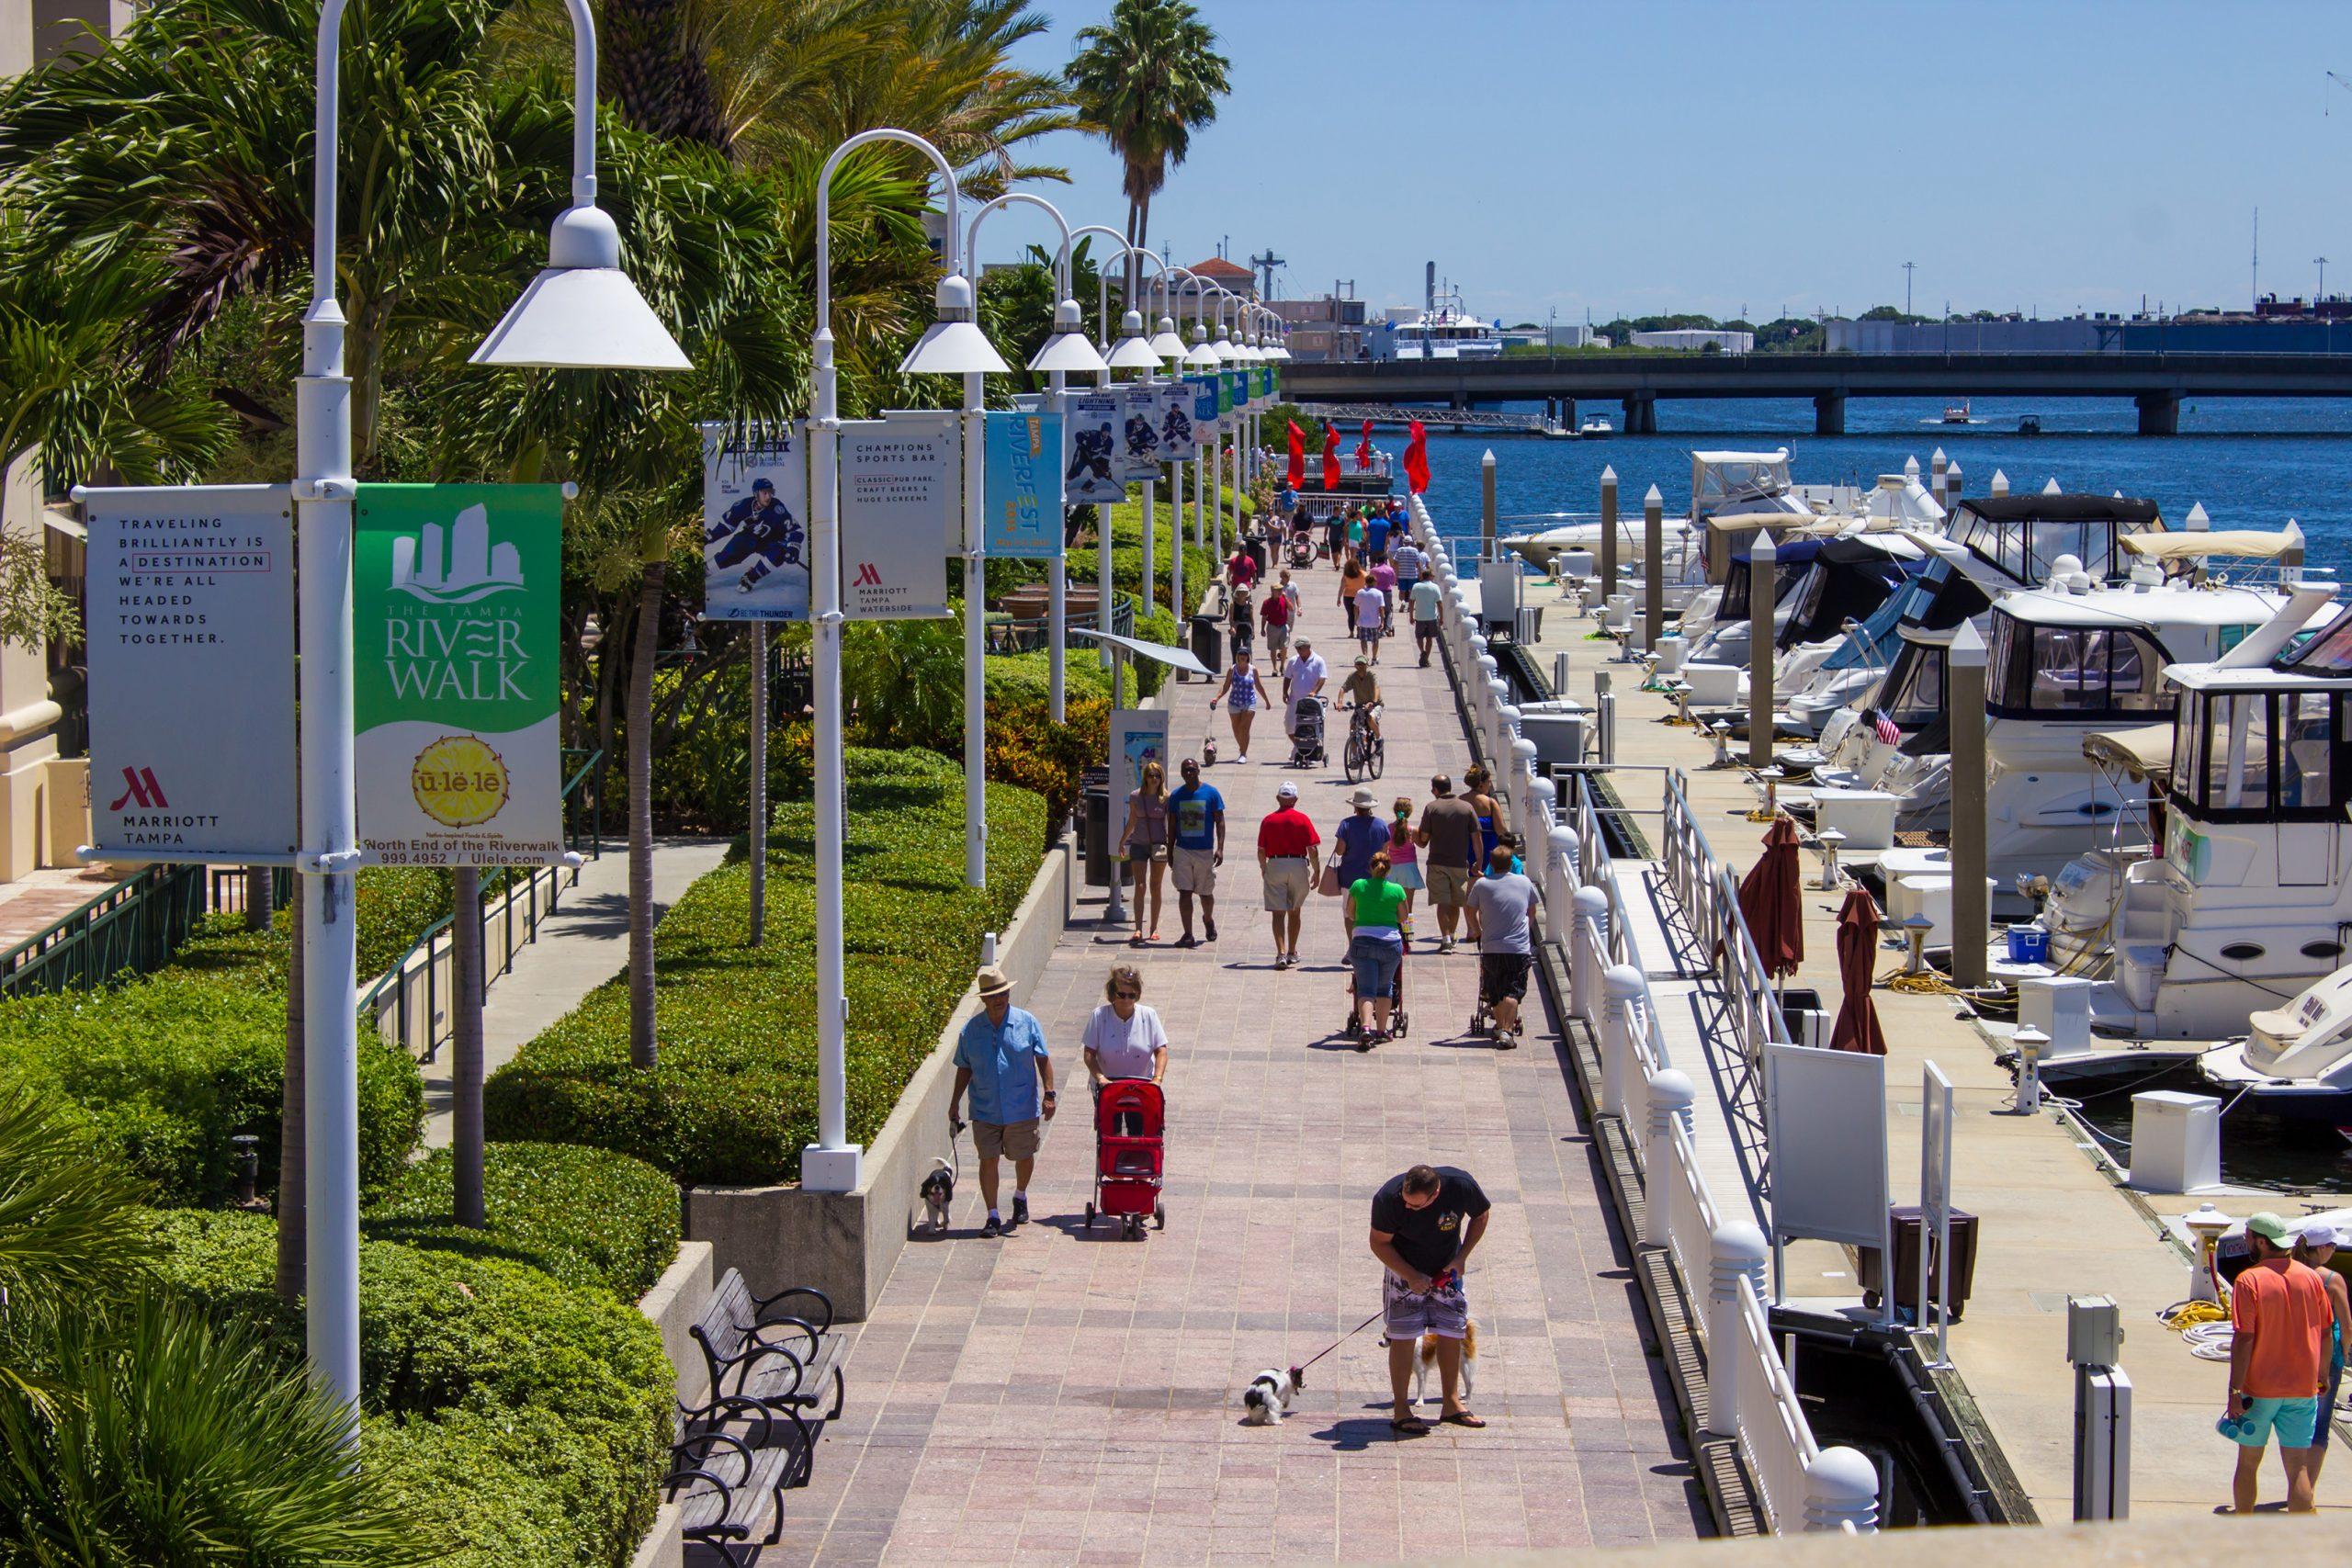 Tampa, Florida - Riverwalk